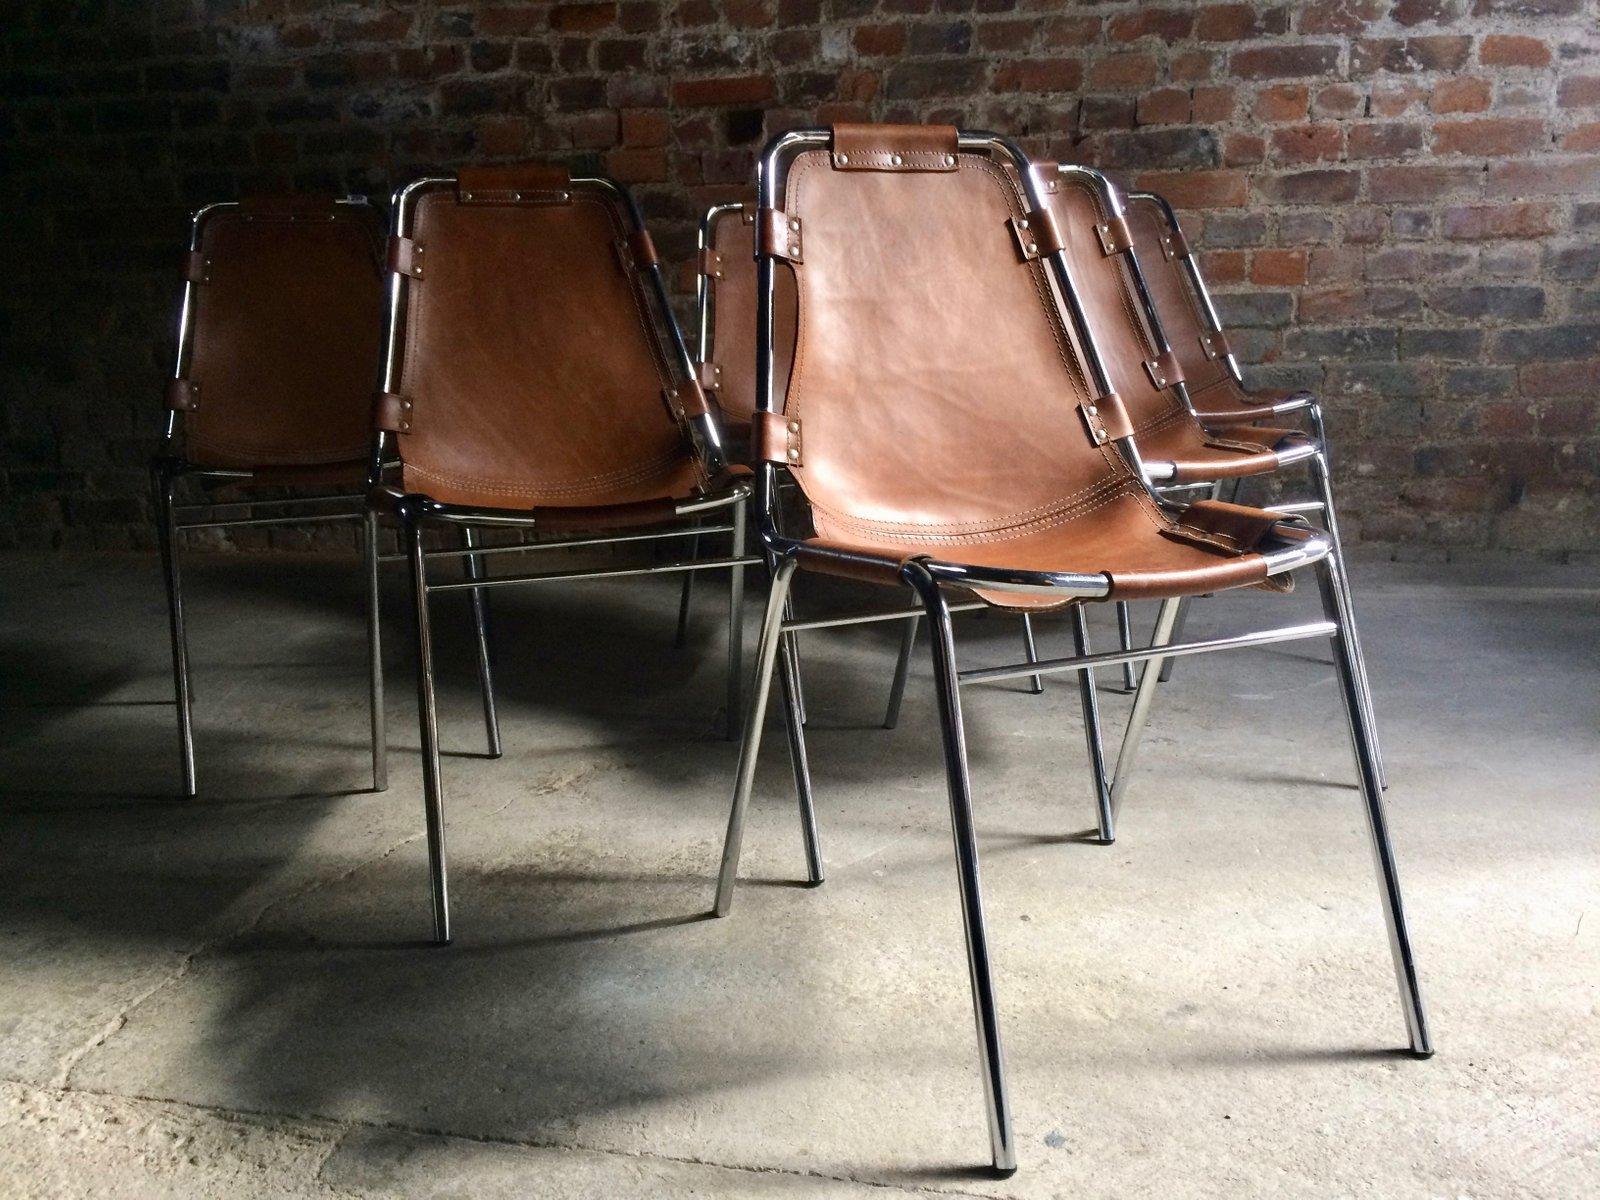 esszimmerst hle aus leder von charlotte perriand f r cassina 1960er 6er set bei pamono kaufen. Black Bedroom Furniture Sets. Home Design Ideas